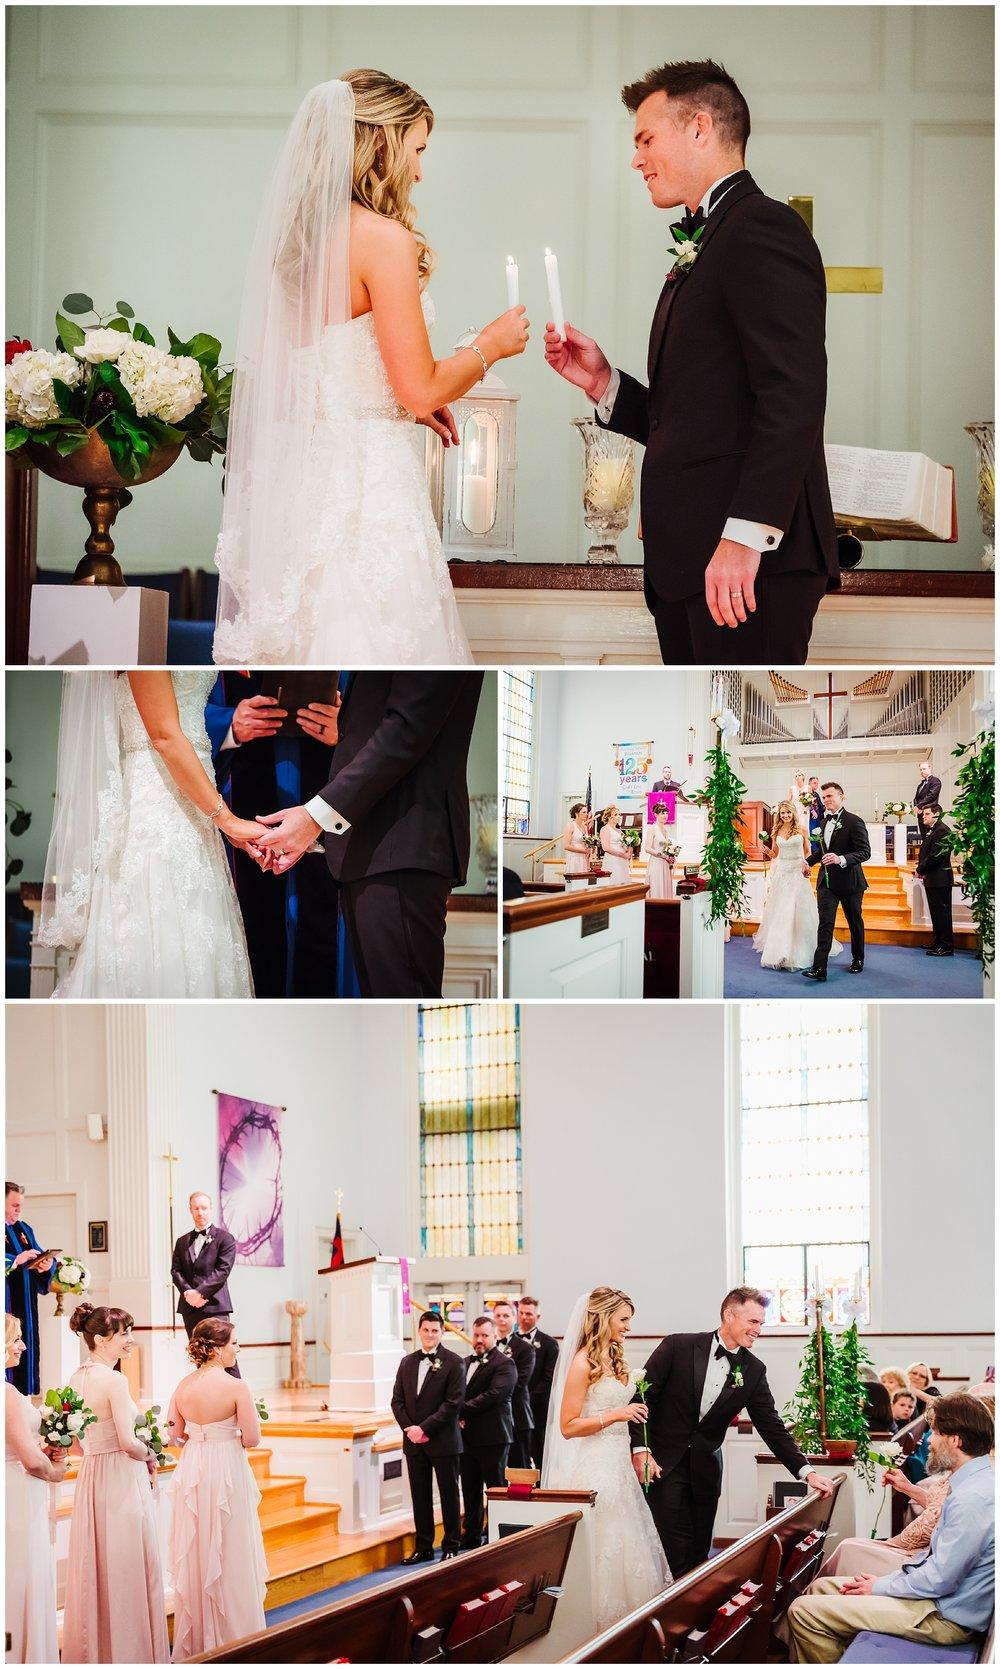 tampa-bradenton-wedding-photographer-south-florida-museum-classic-blush-gold-alpacas-sparklers_0053.jpg